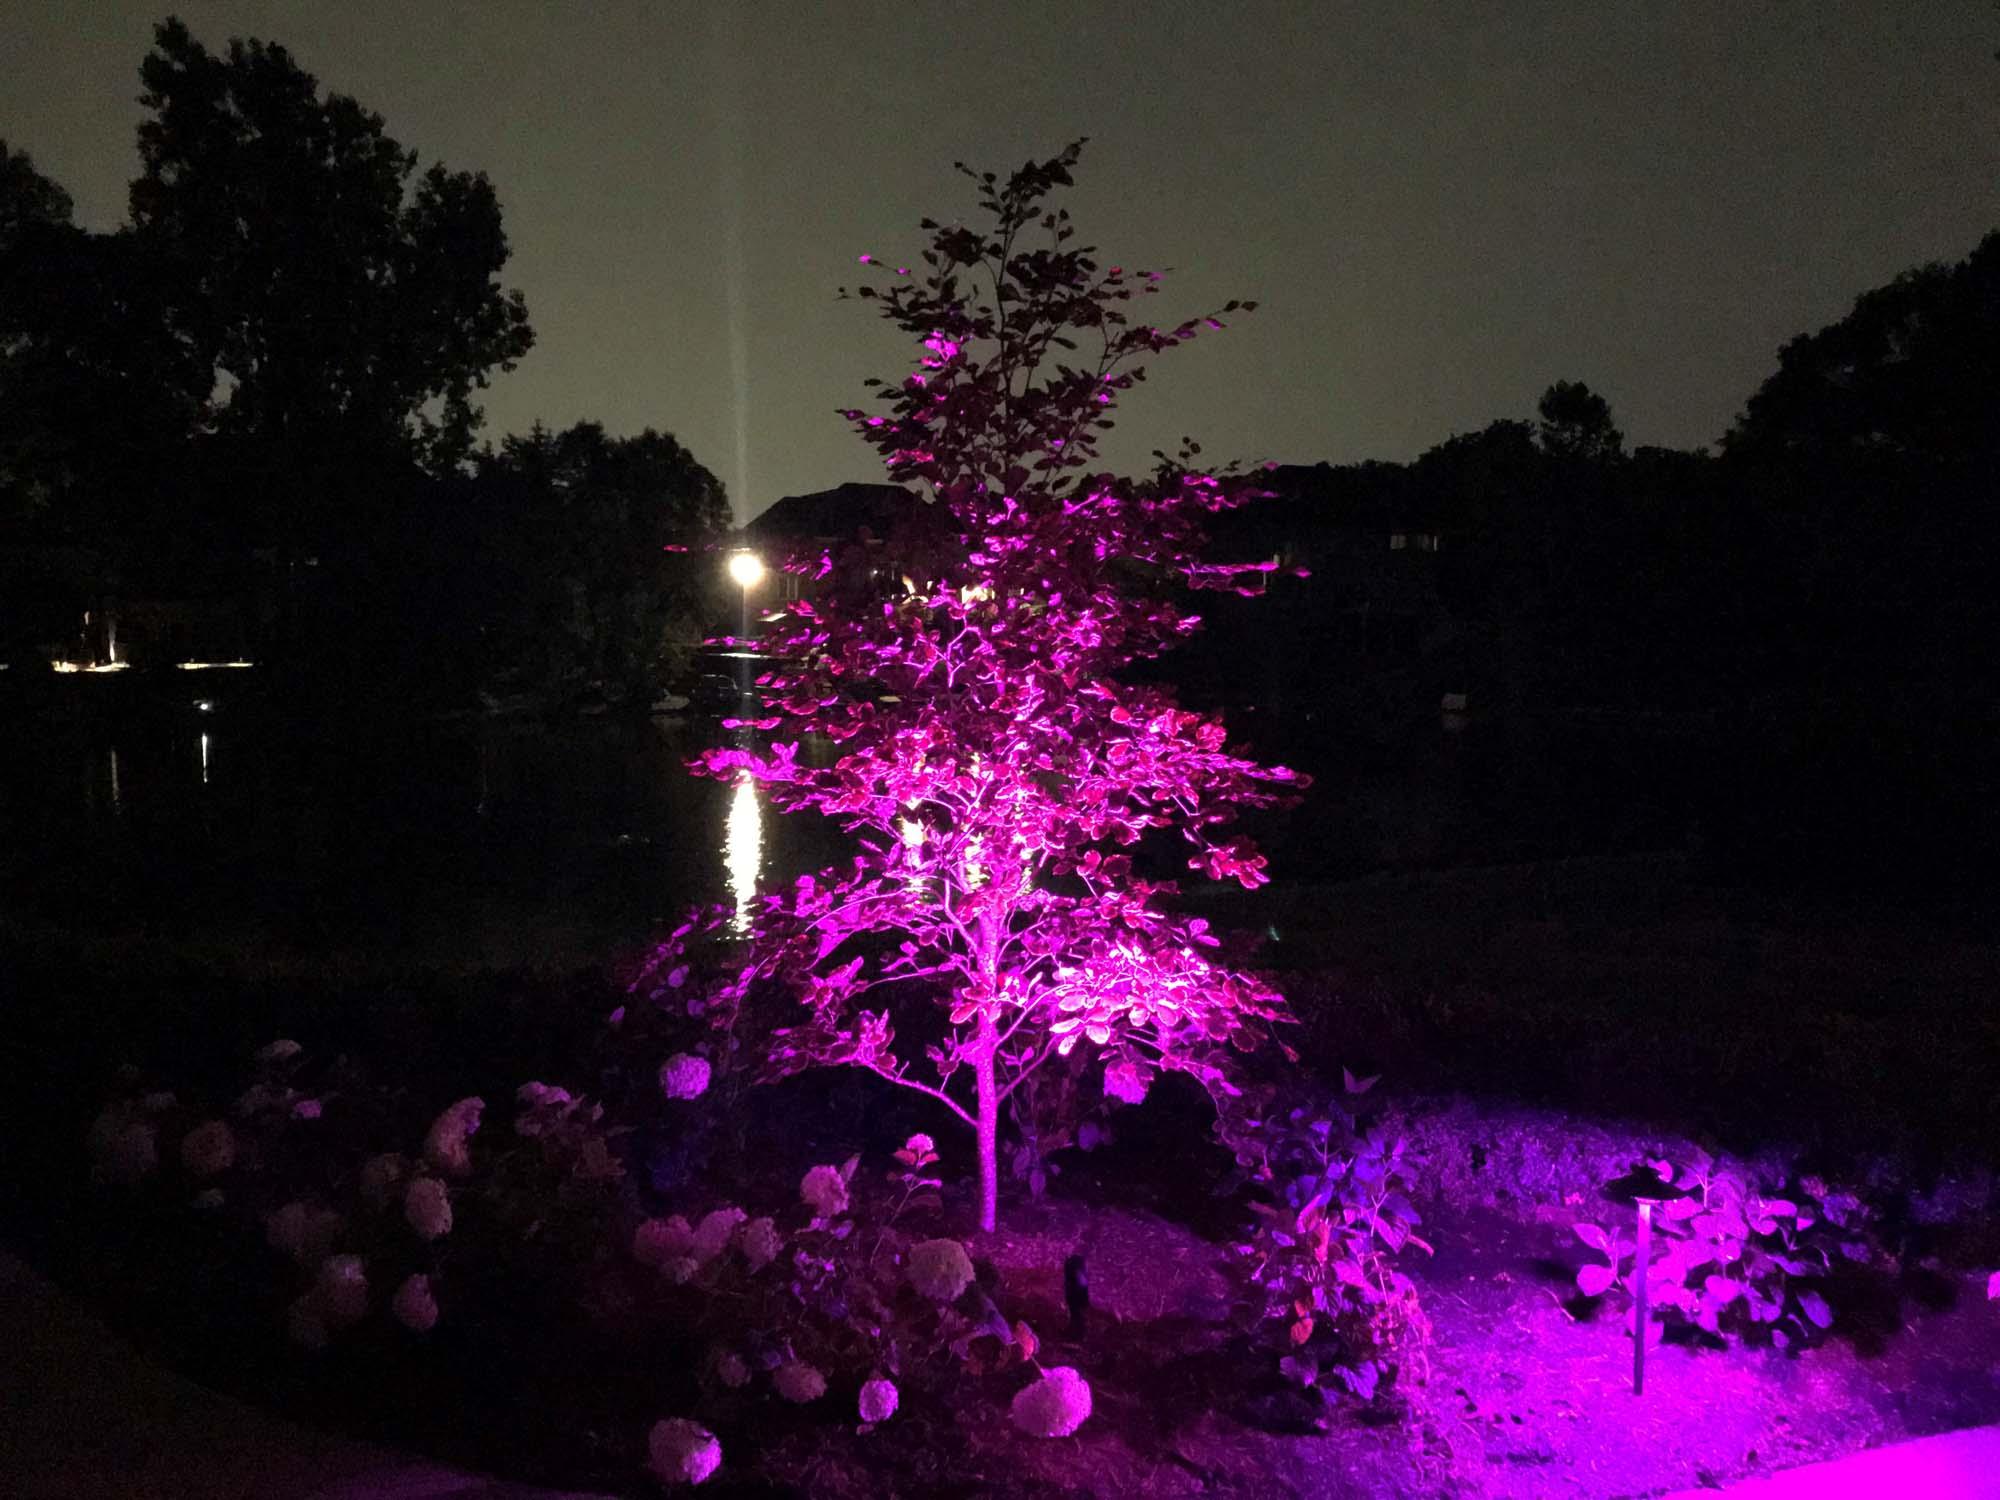 maddox color lighting pic 4